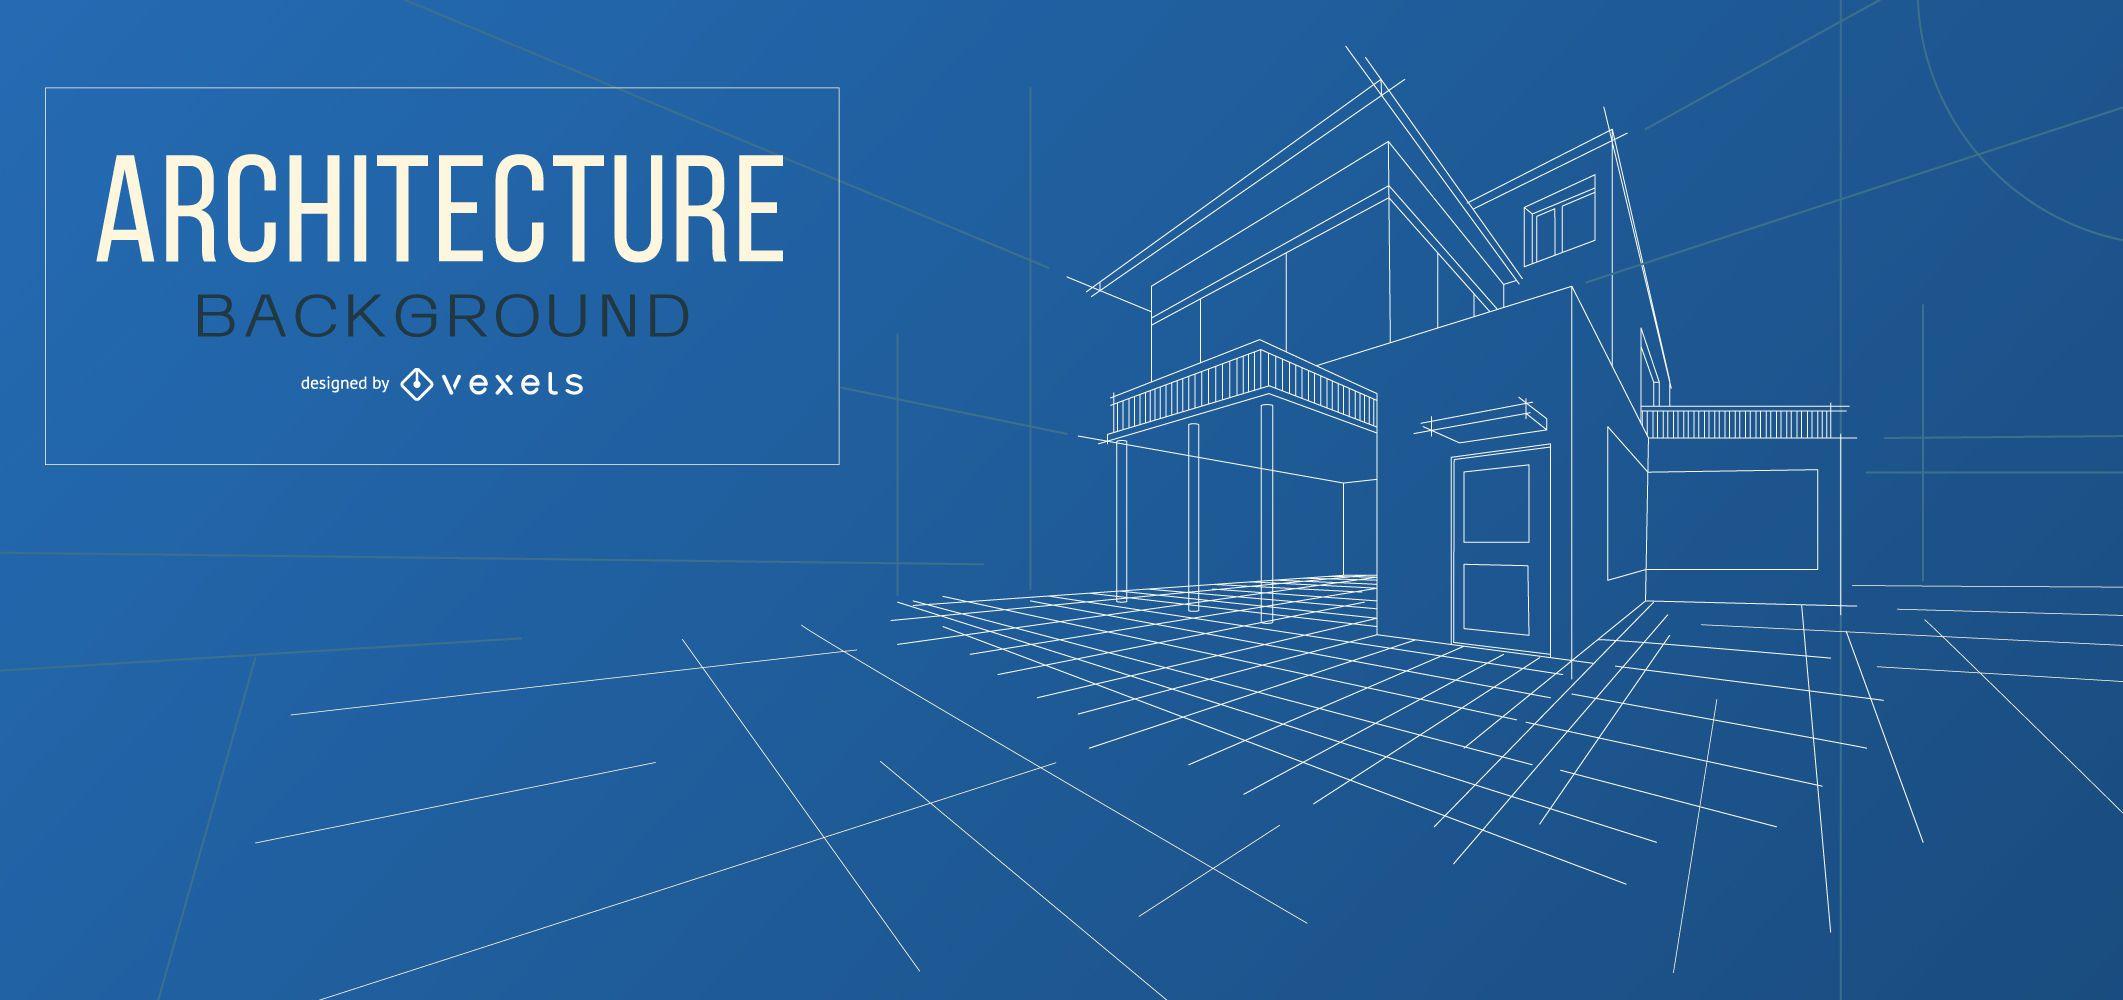 Architecture blueprint background design